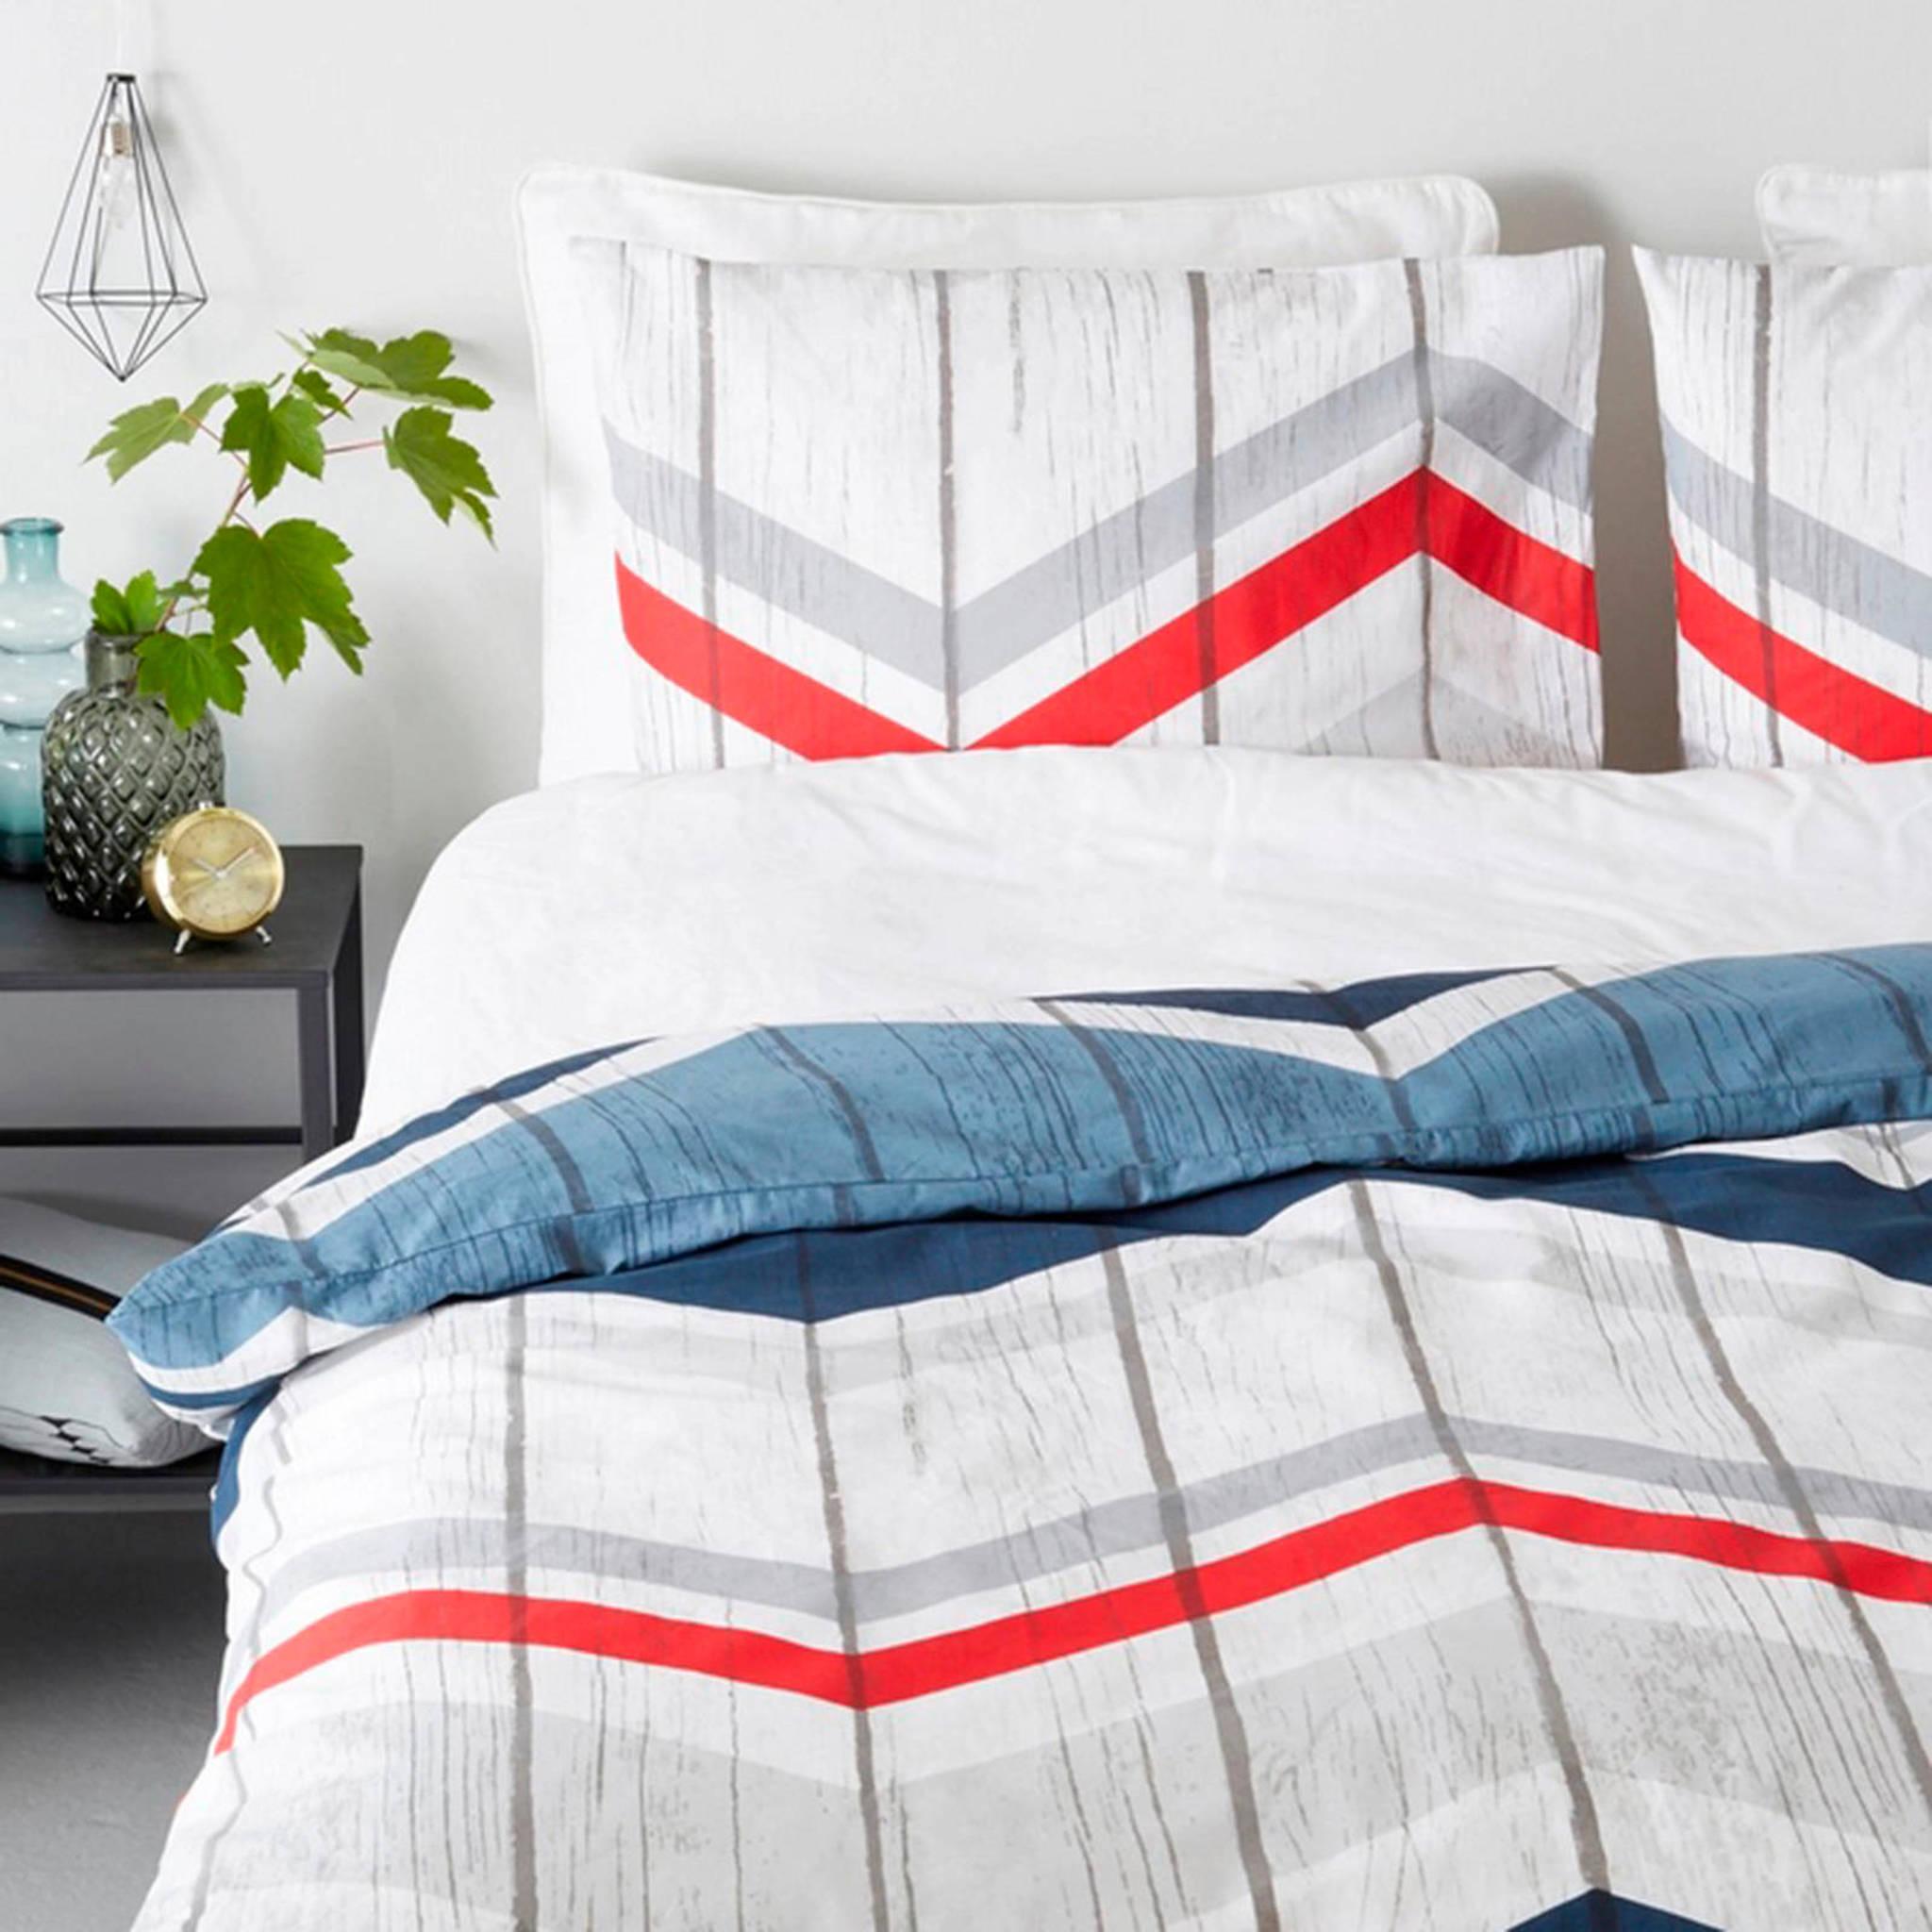 good morning katoenen dekbedovertrek lits jumeaux blauw